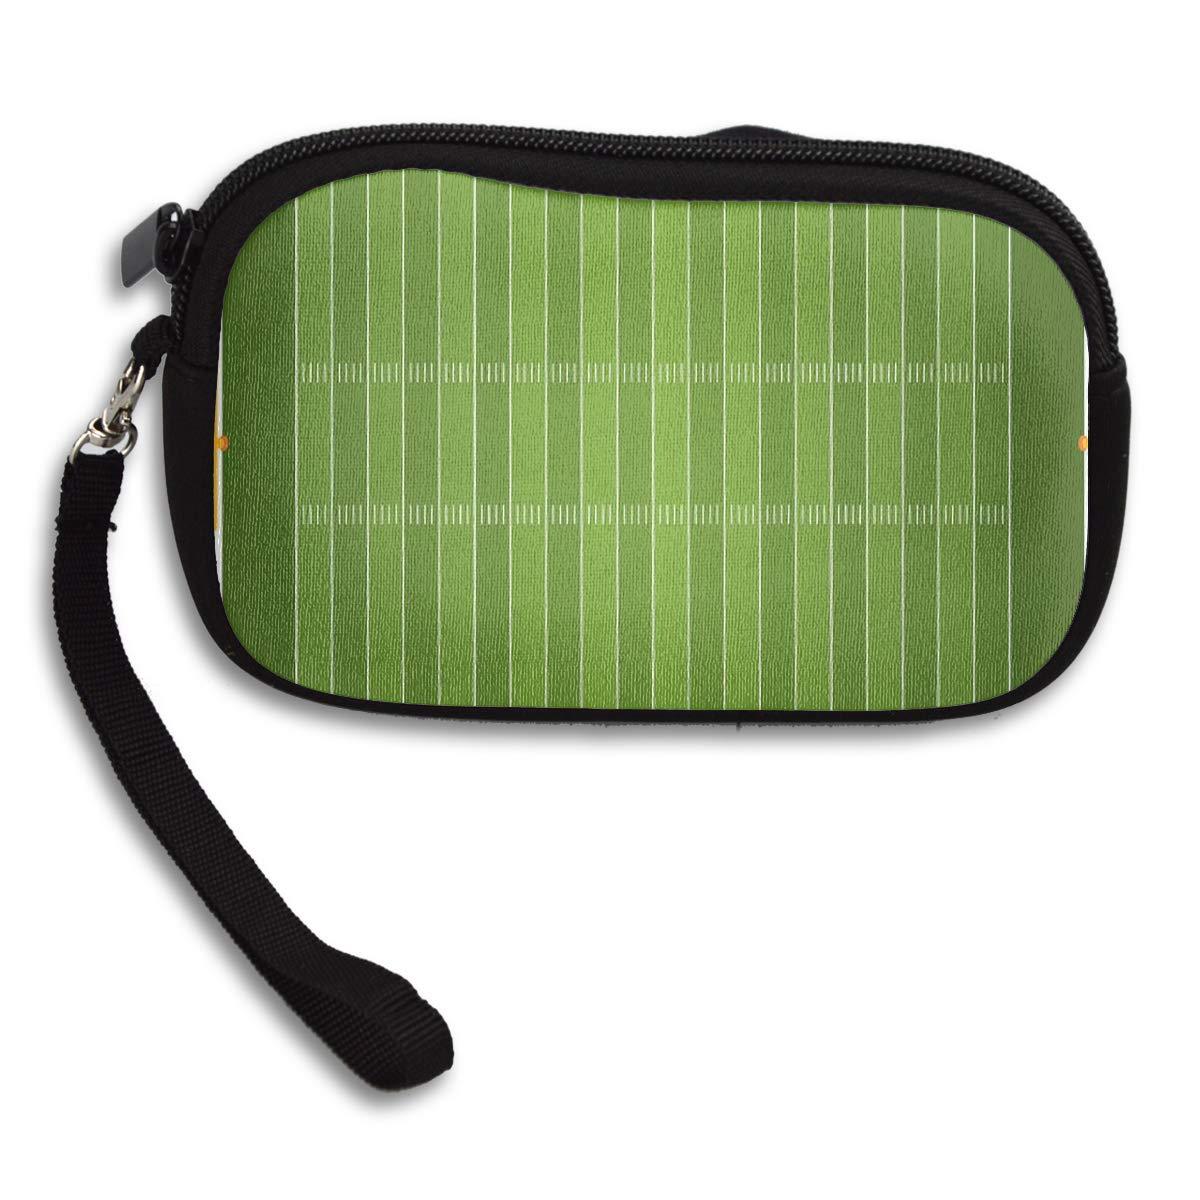 Football Sports Field Green Yard Games Coin Pouch Clutch Purse Wristlet Wallet Phone Card Holder Handbag